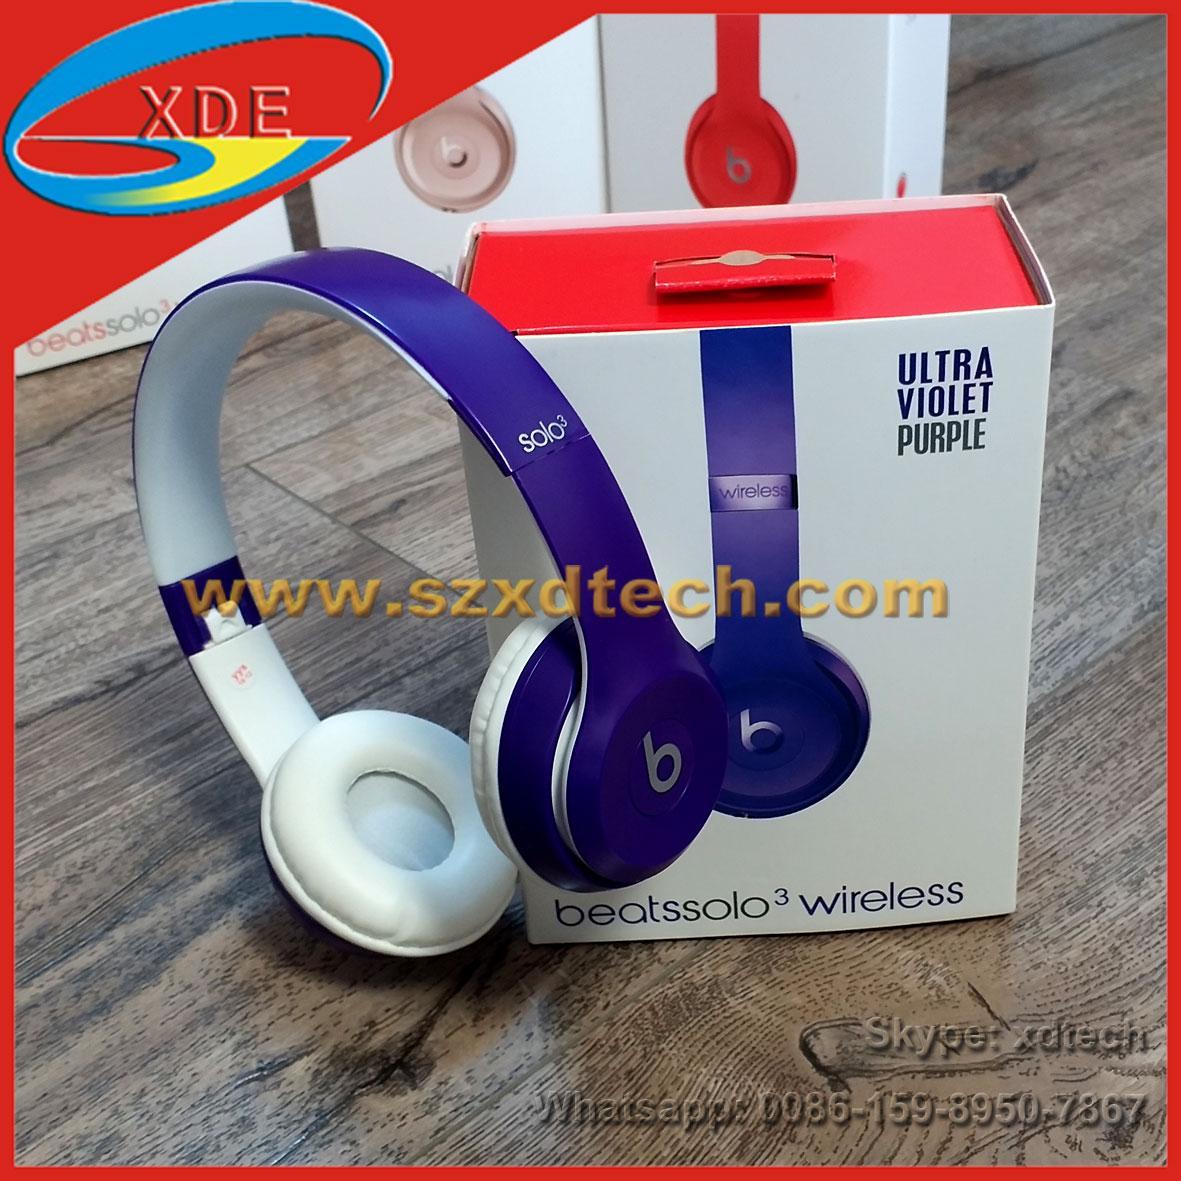 Good Clone Beatssolo 3 Wireless Beats by dro Wireless Headsets